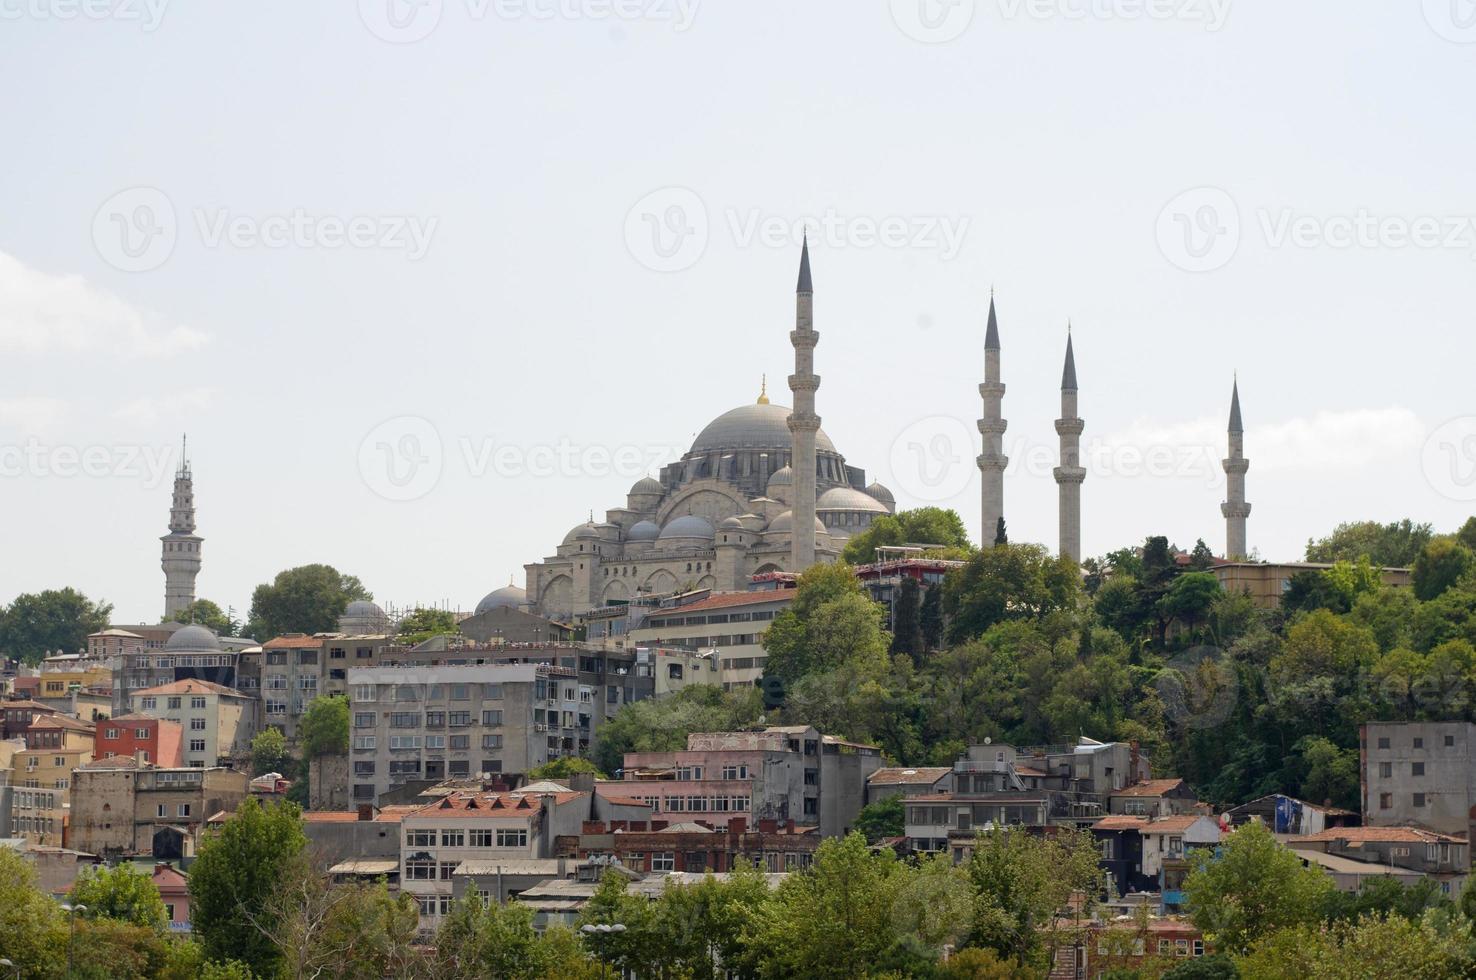 Blick auf Suleymaniye Camii (Suleymaniye Moschee) Istanbul Stadt, Türkei foto